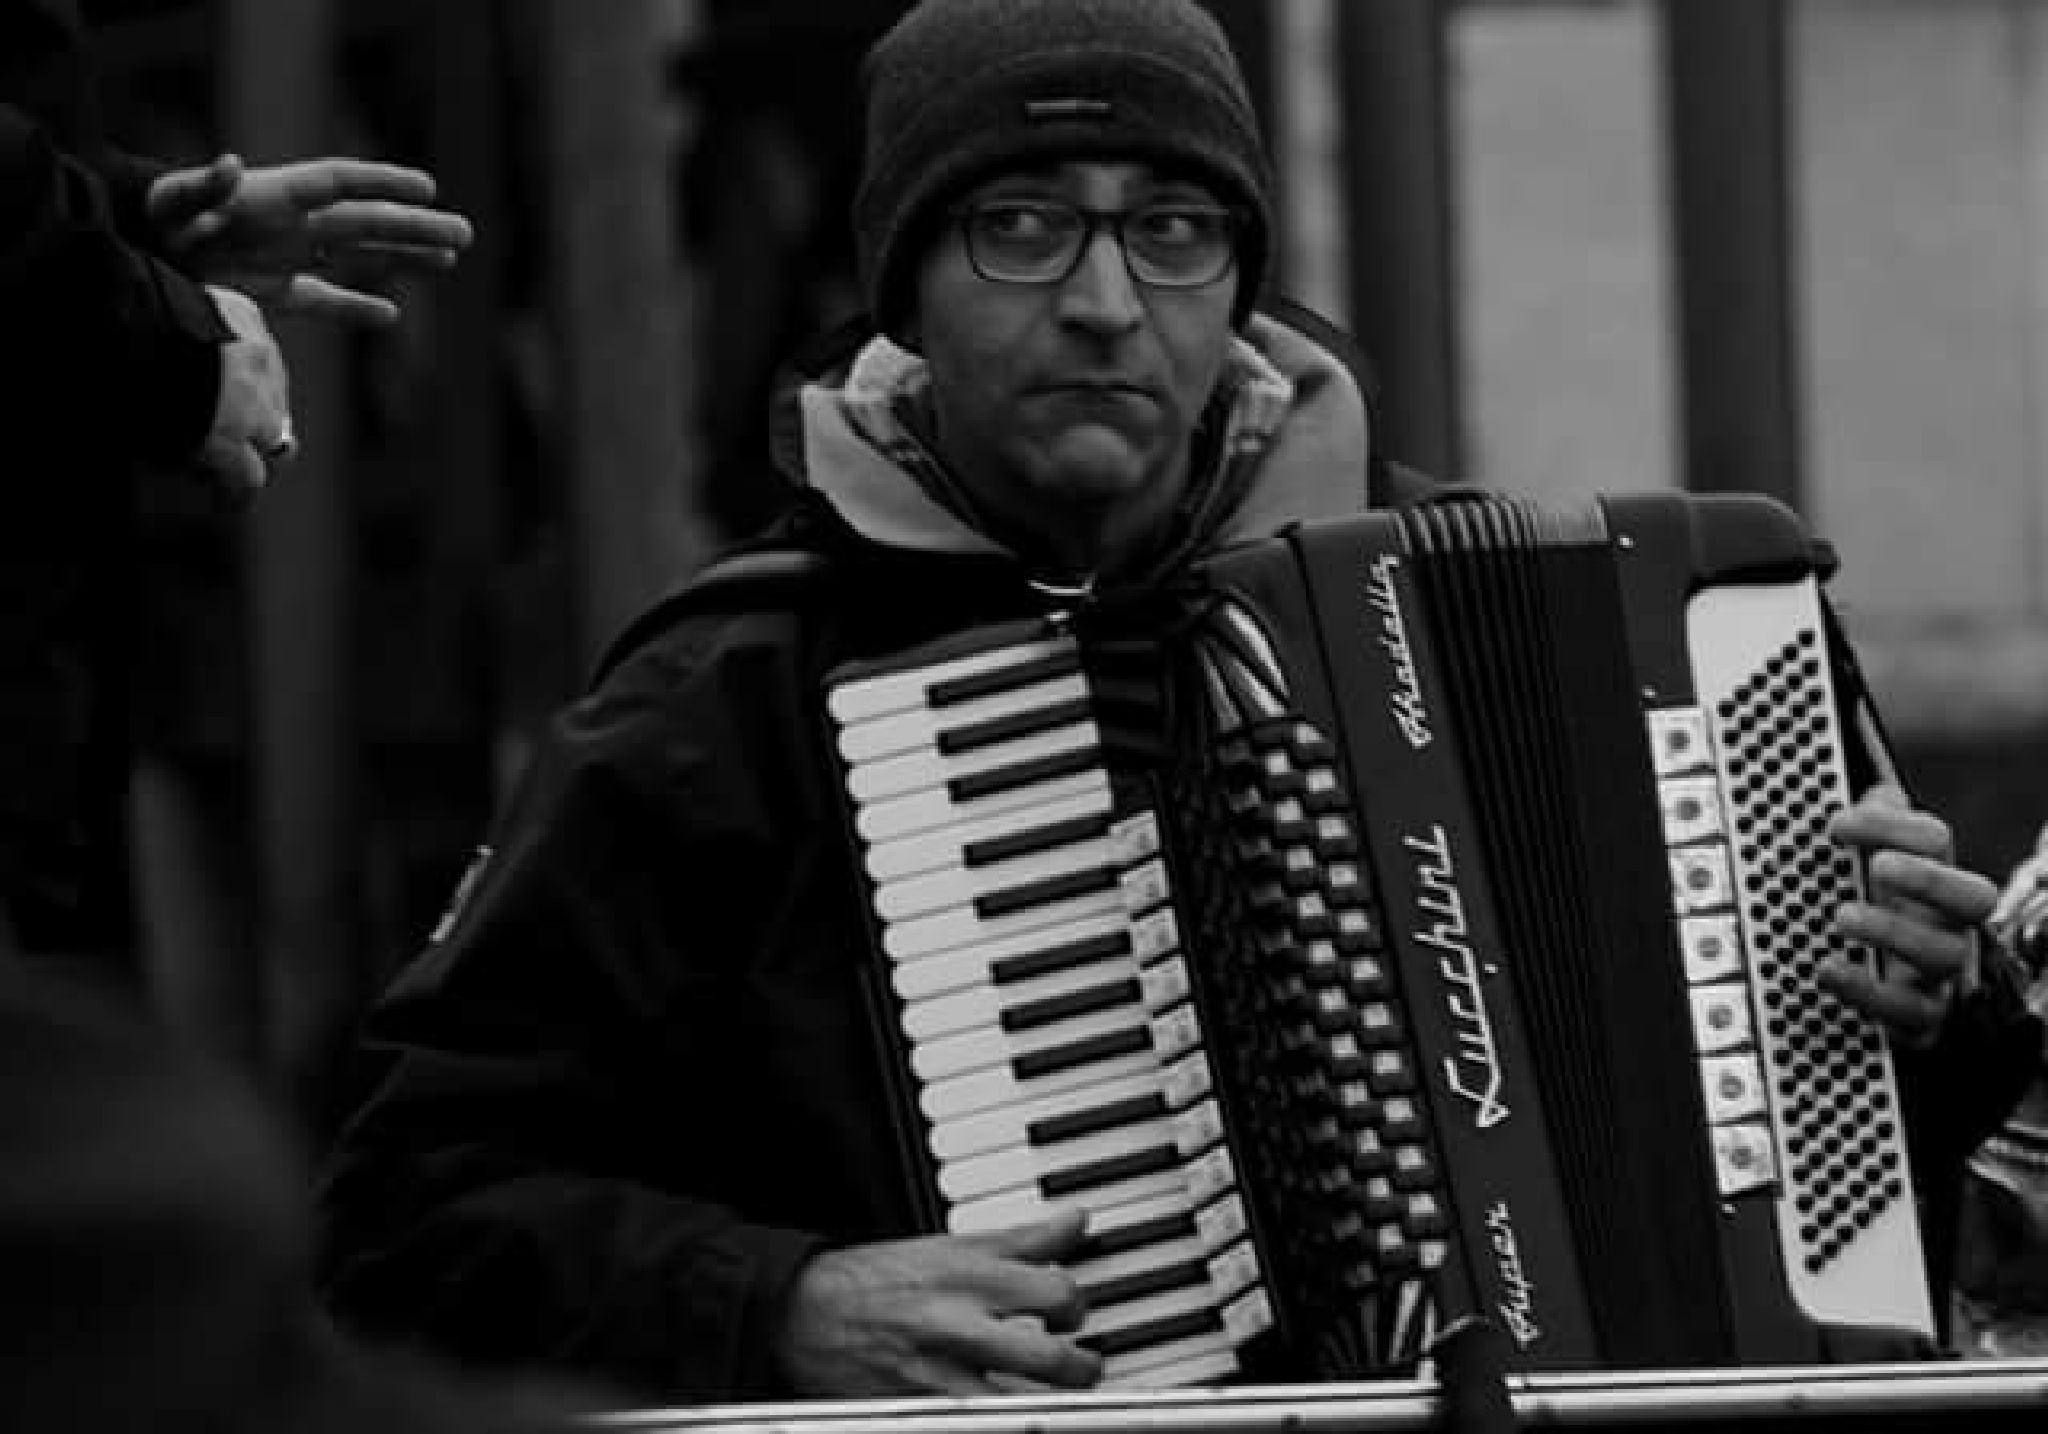 the acordeon player by thierrylorenzo